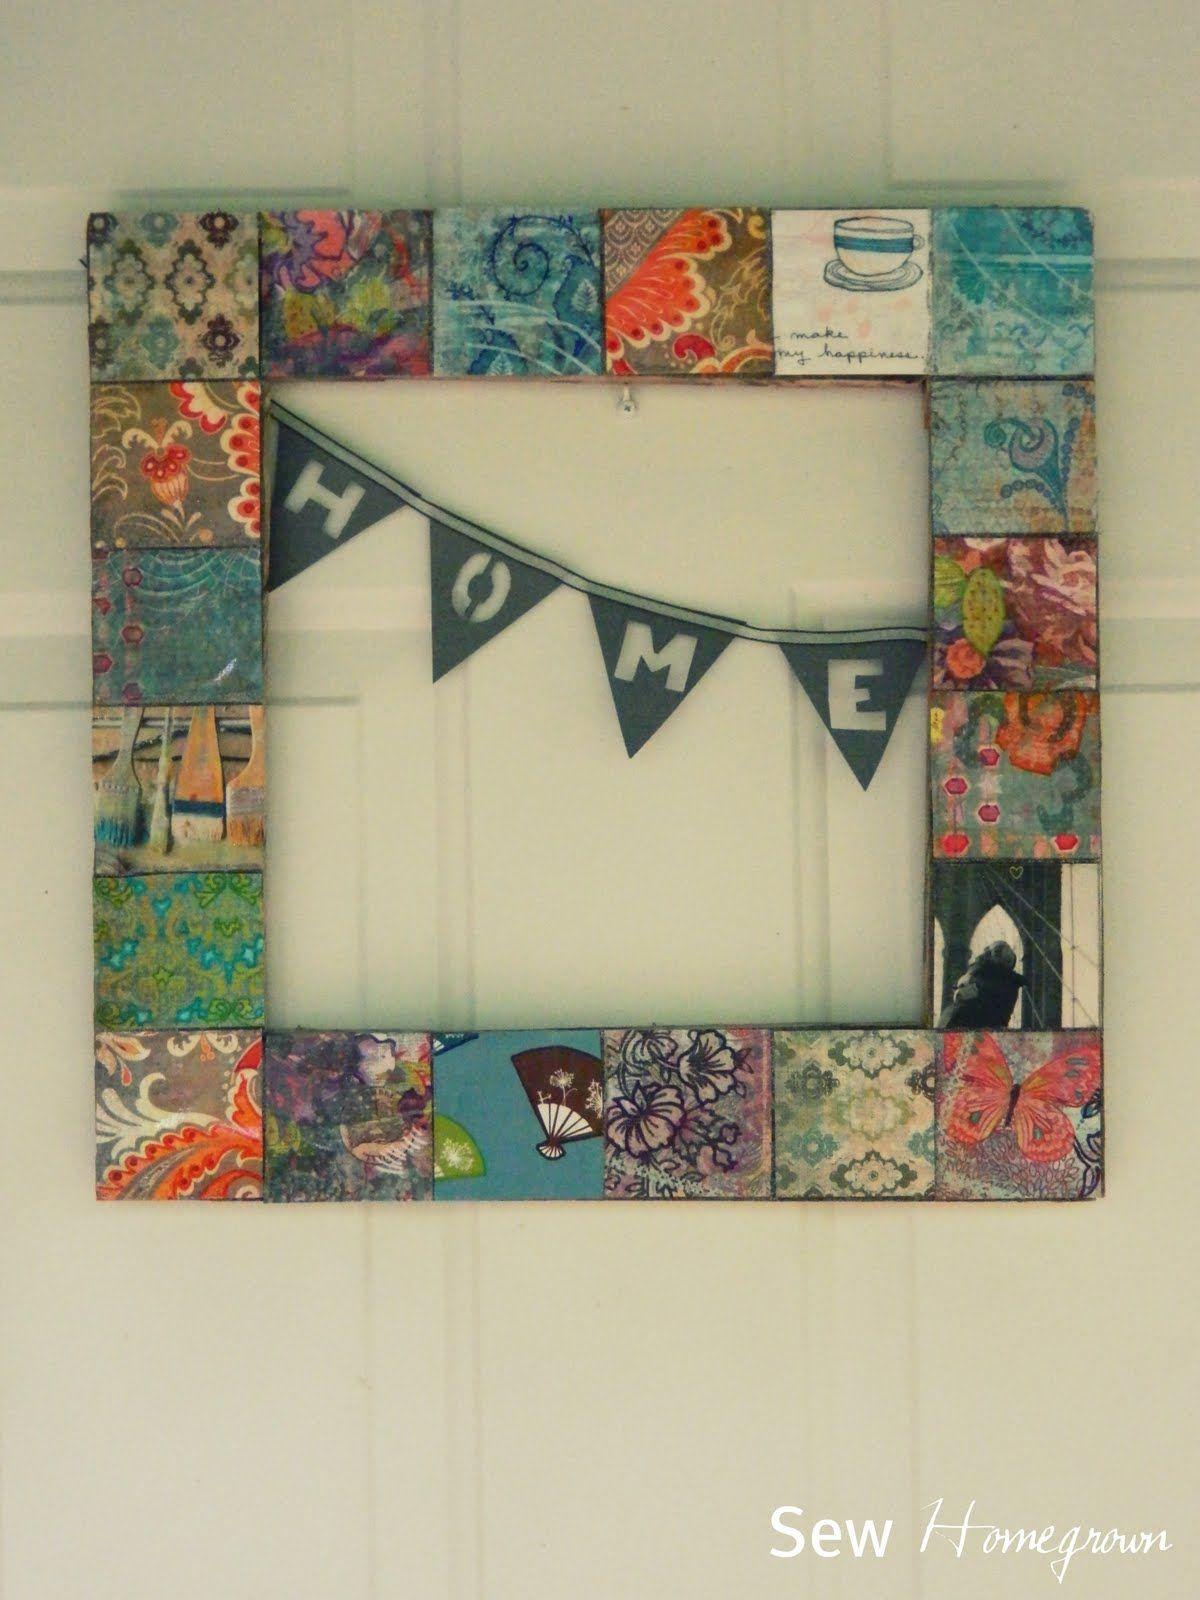 Sew Homegrown *Ctsb*{Diy} Anthopologie Inspired Door Hanging